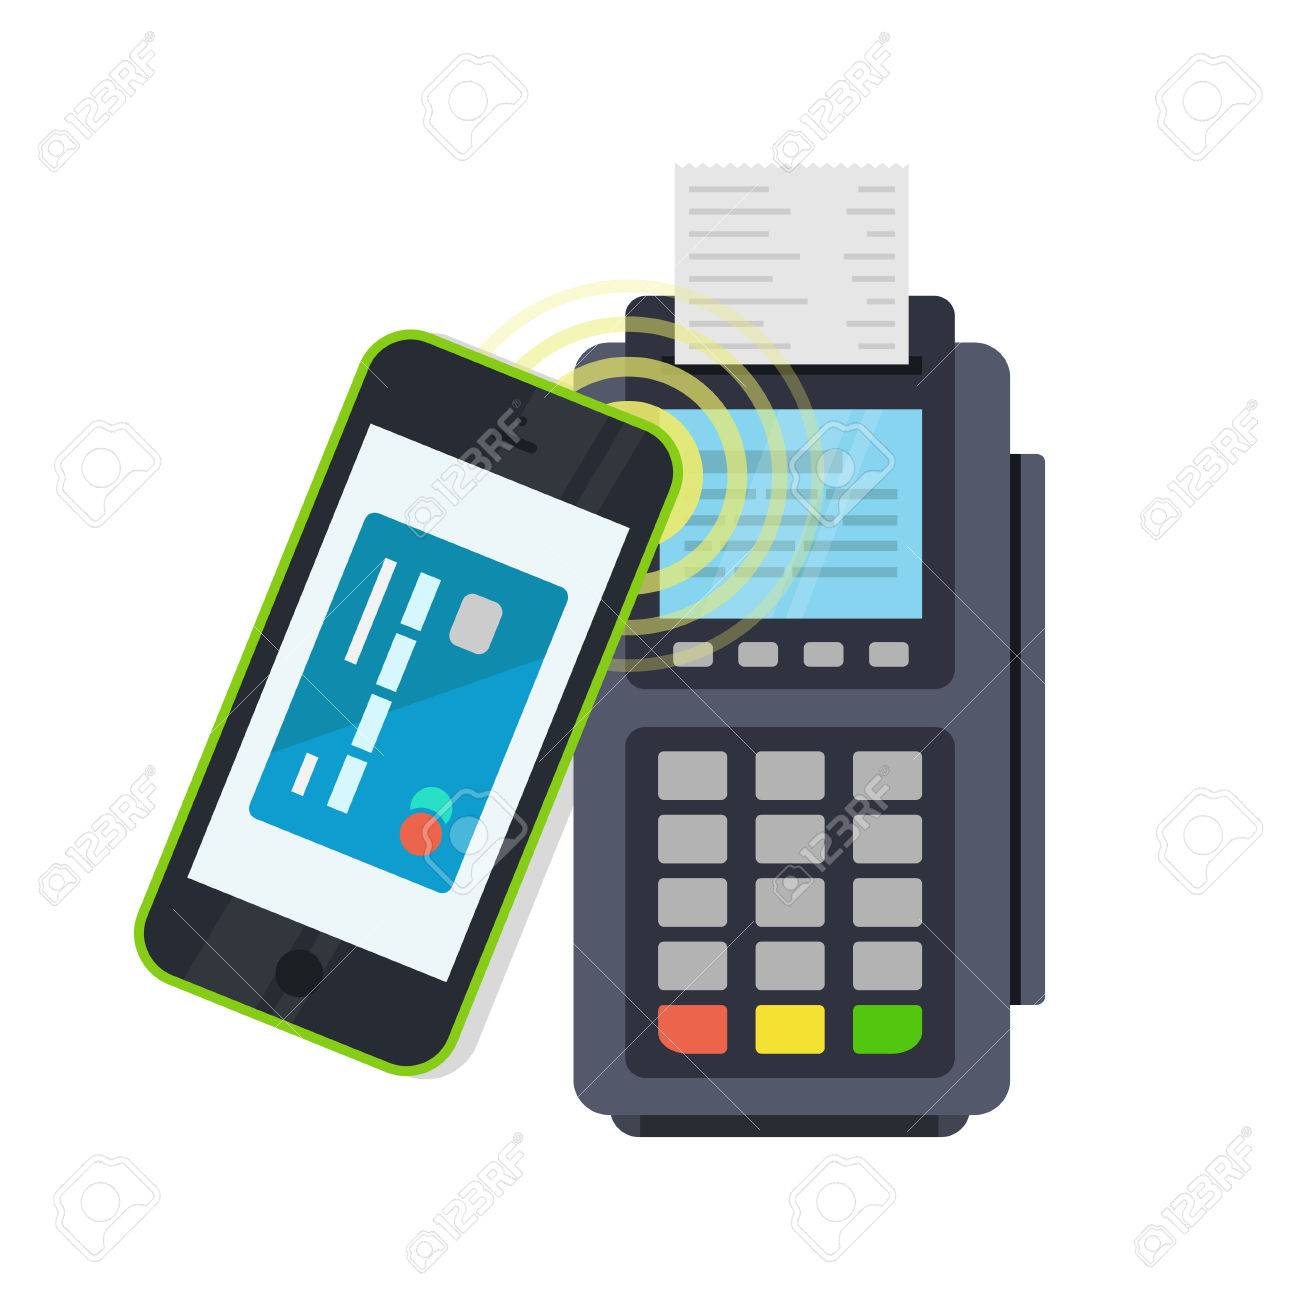 POS terminal confirms the payment made through mobile phone